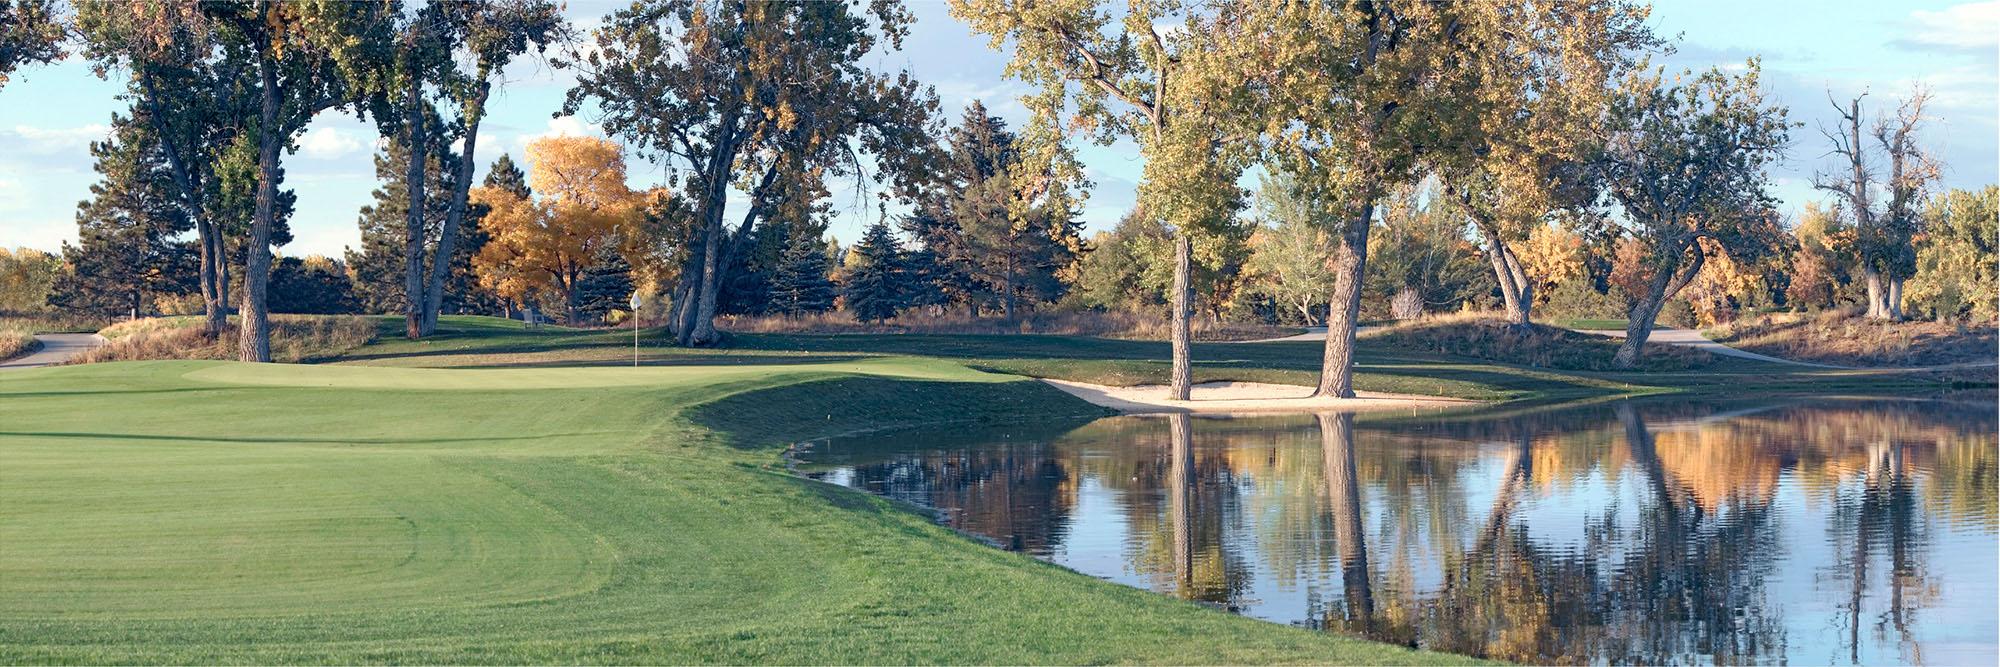 Golf Course Image - Cherry Creek No. 6